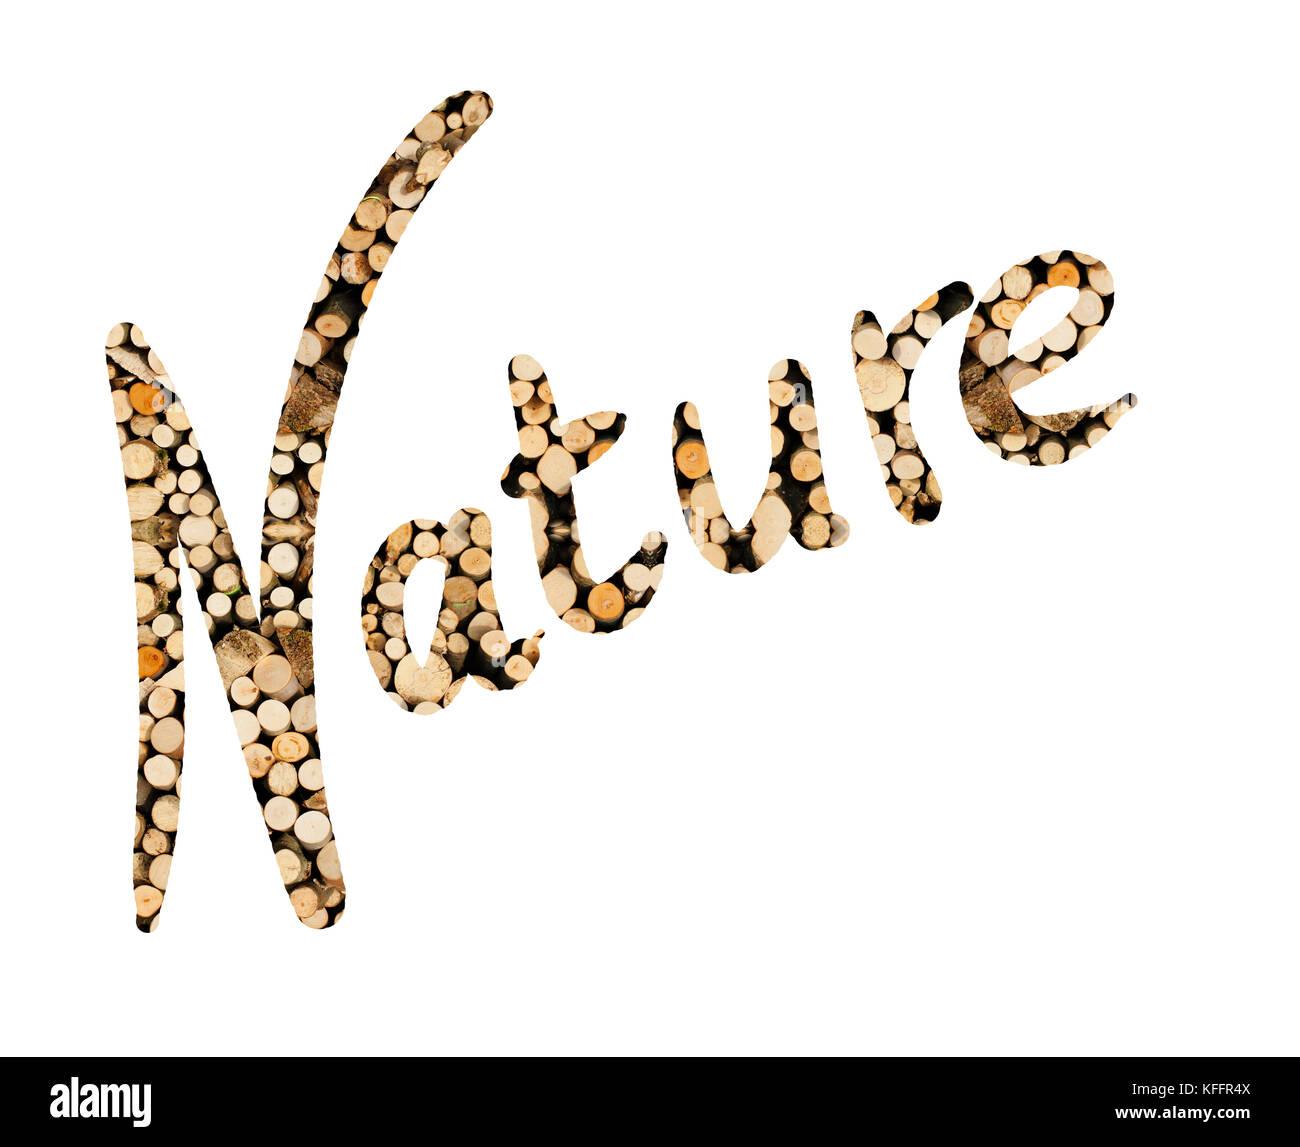 Das Wort Nature aus Holzrollen geschrieben, dargestellt - Stock Image